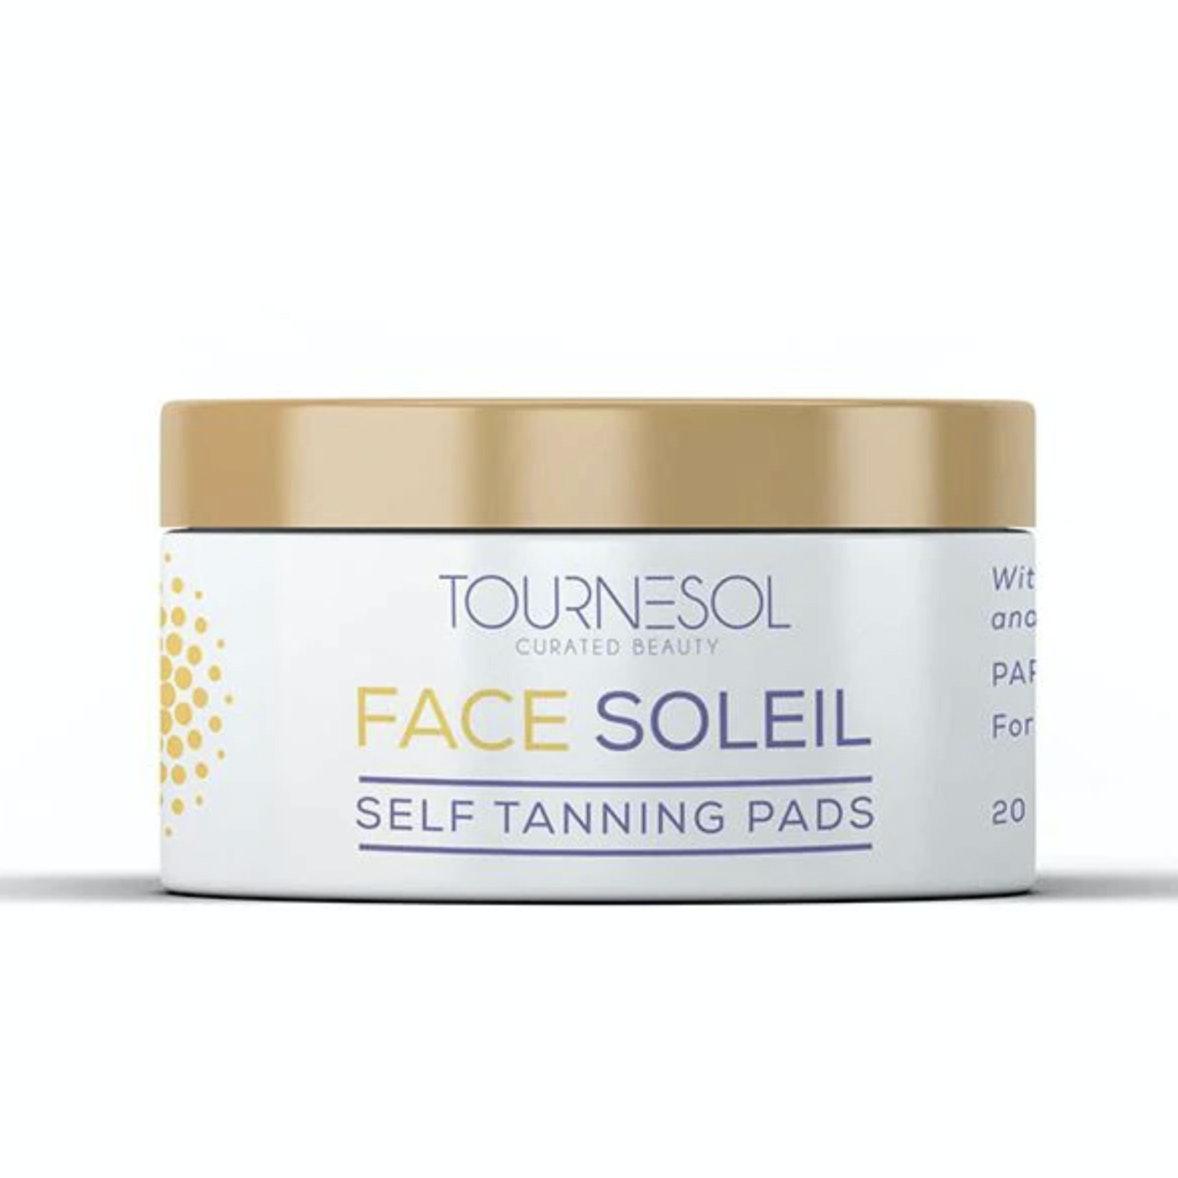 Tournesol® Face Soleil Self-Tanning Pads